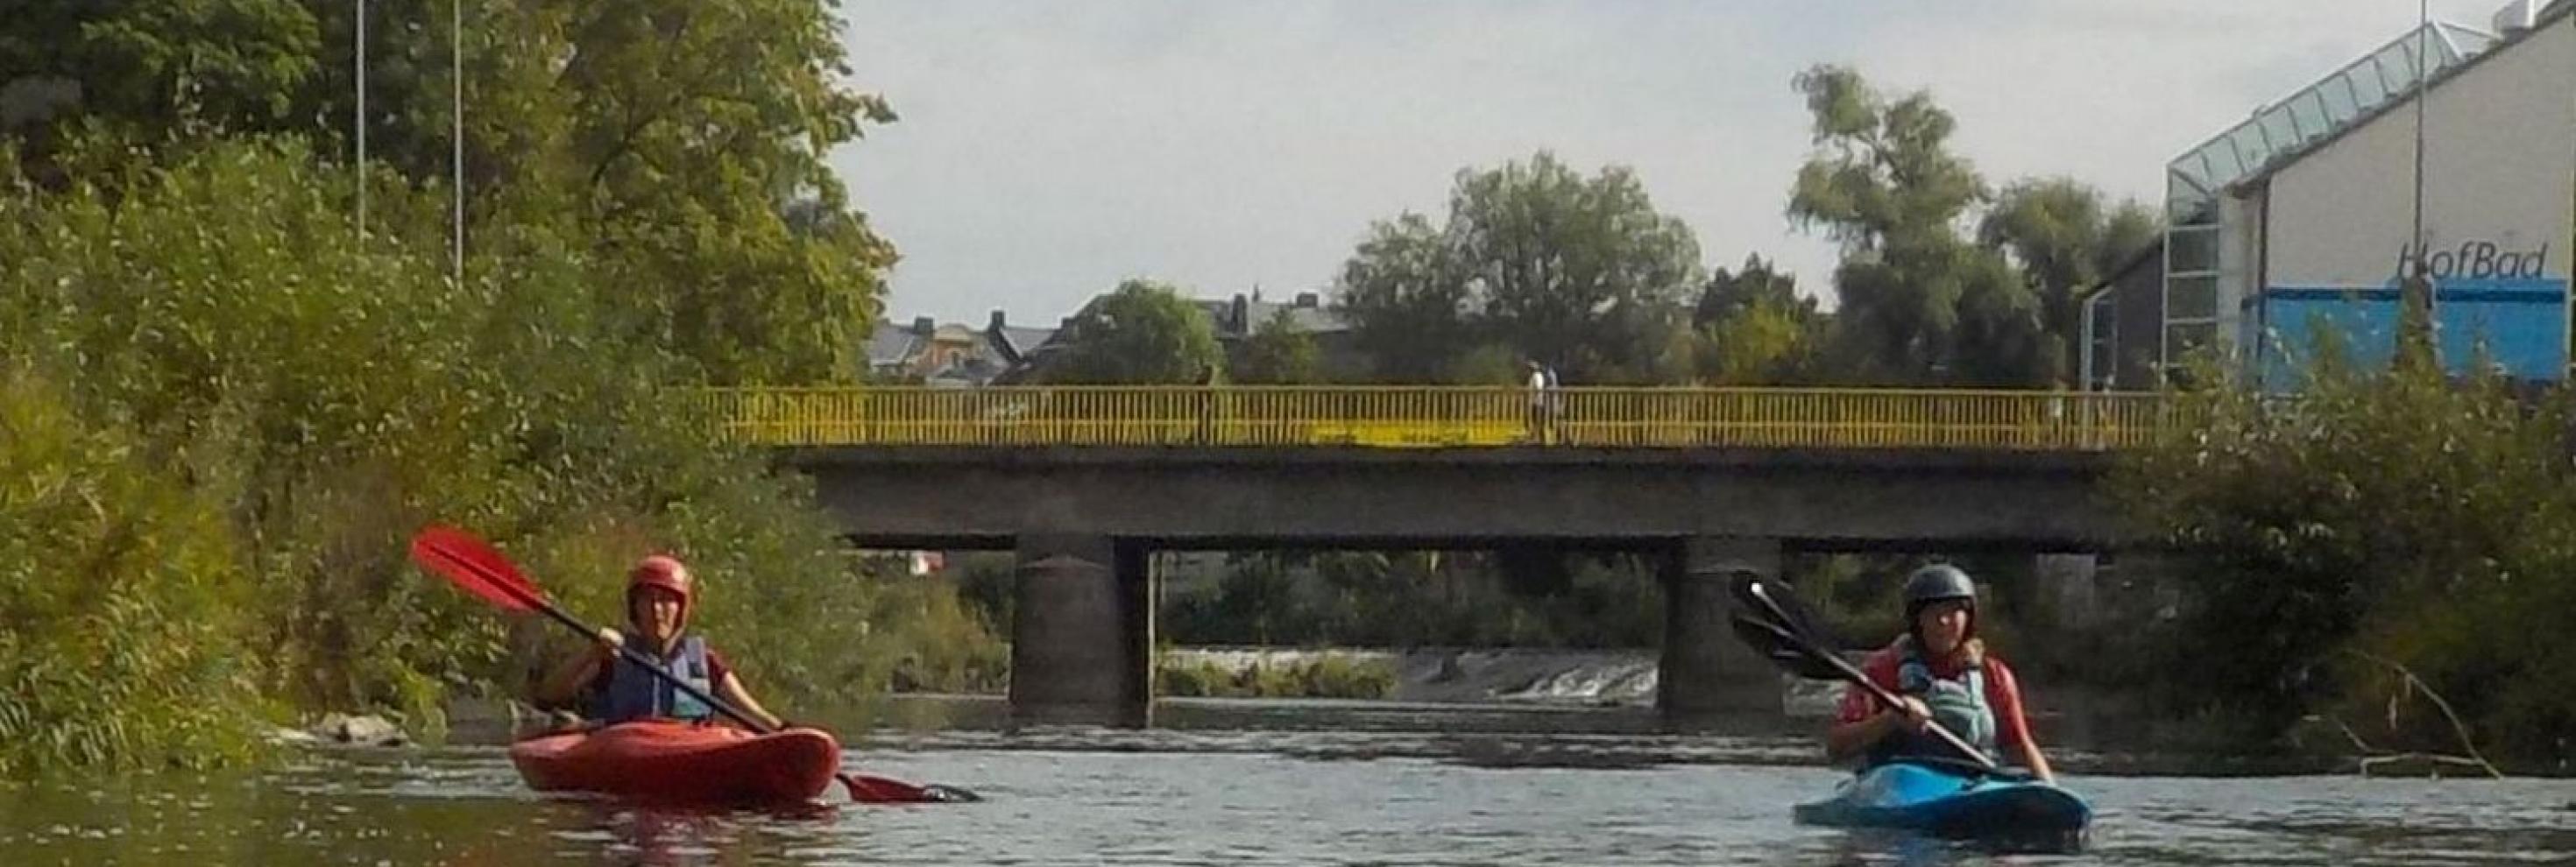 Eva Döhla Paddelt vorm Hofbad